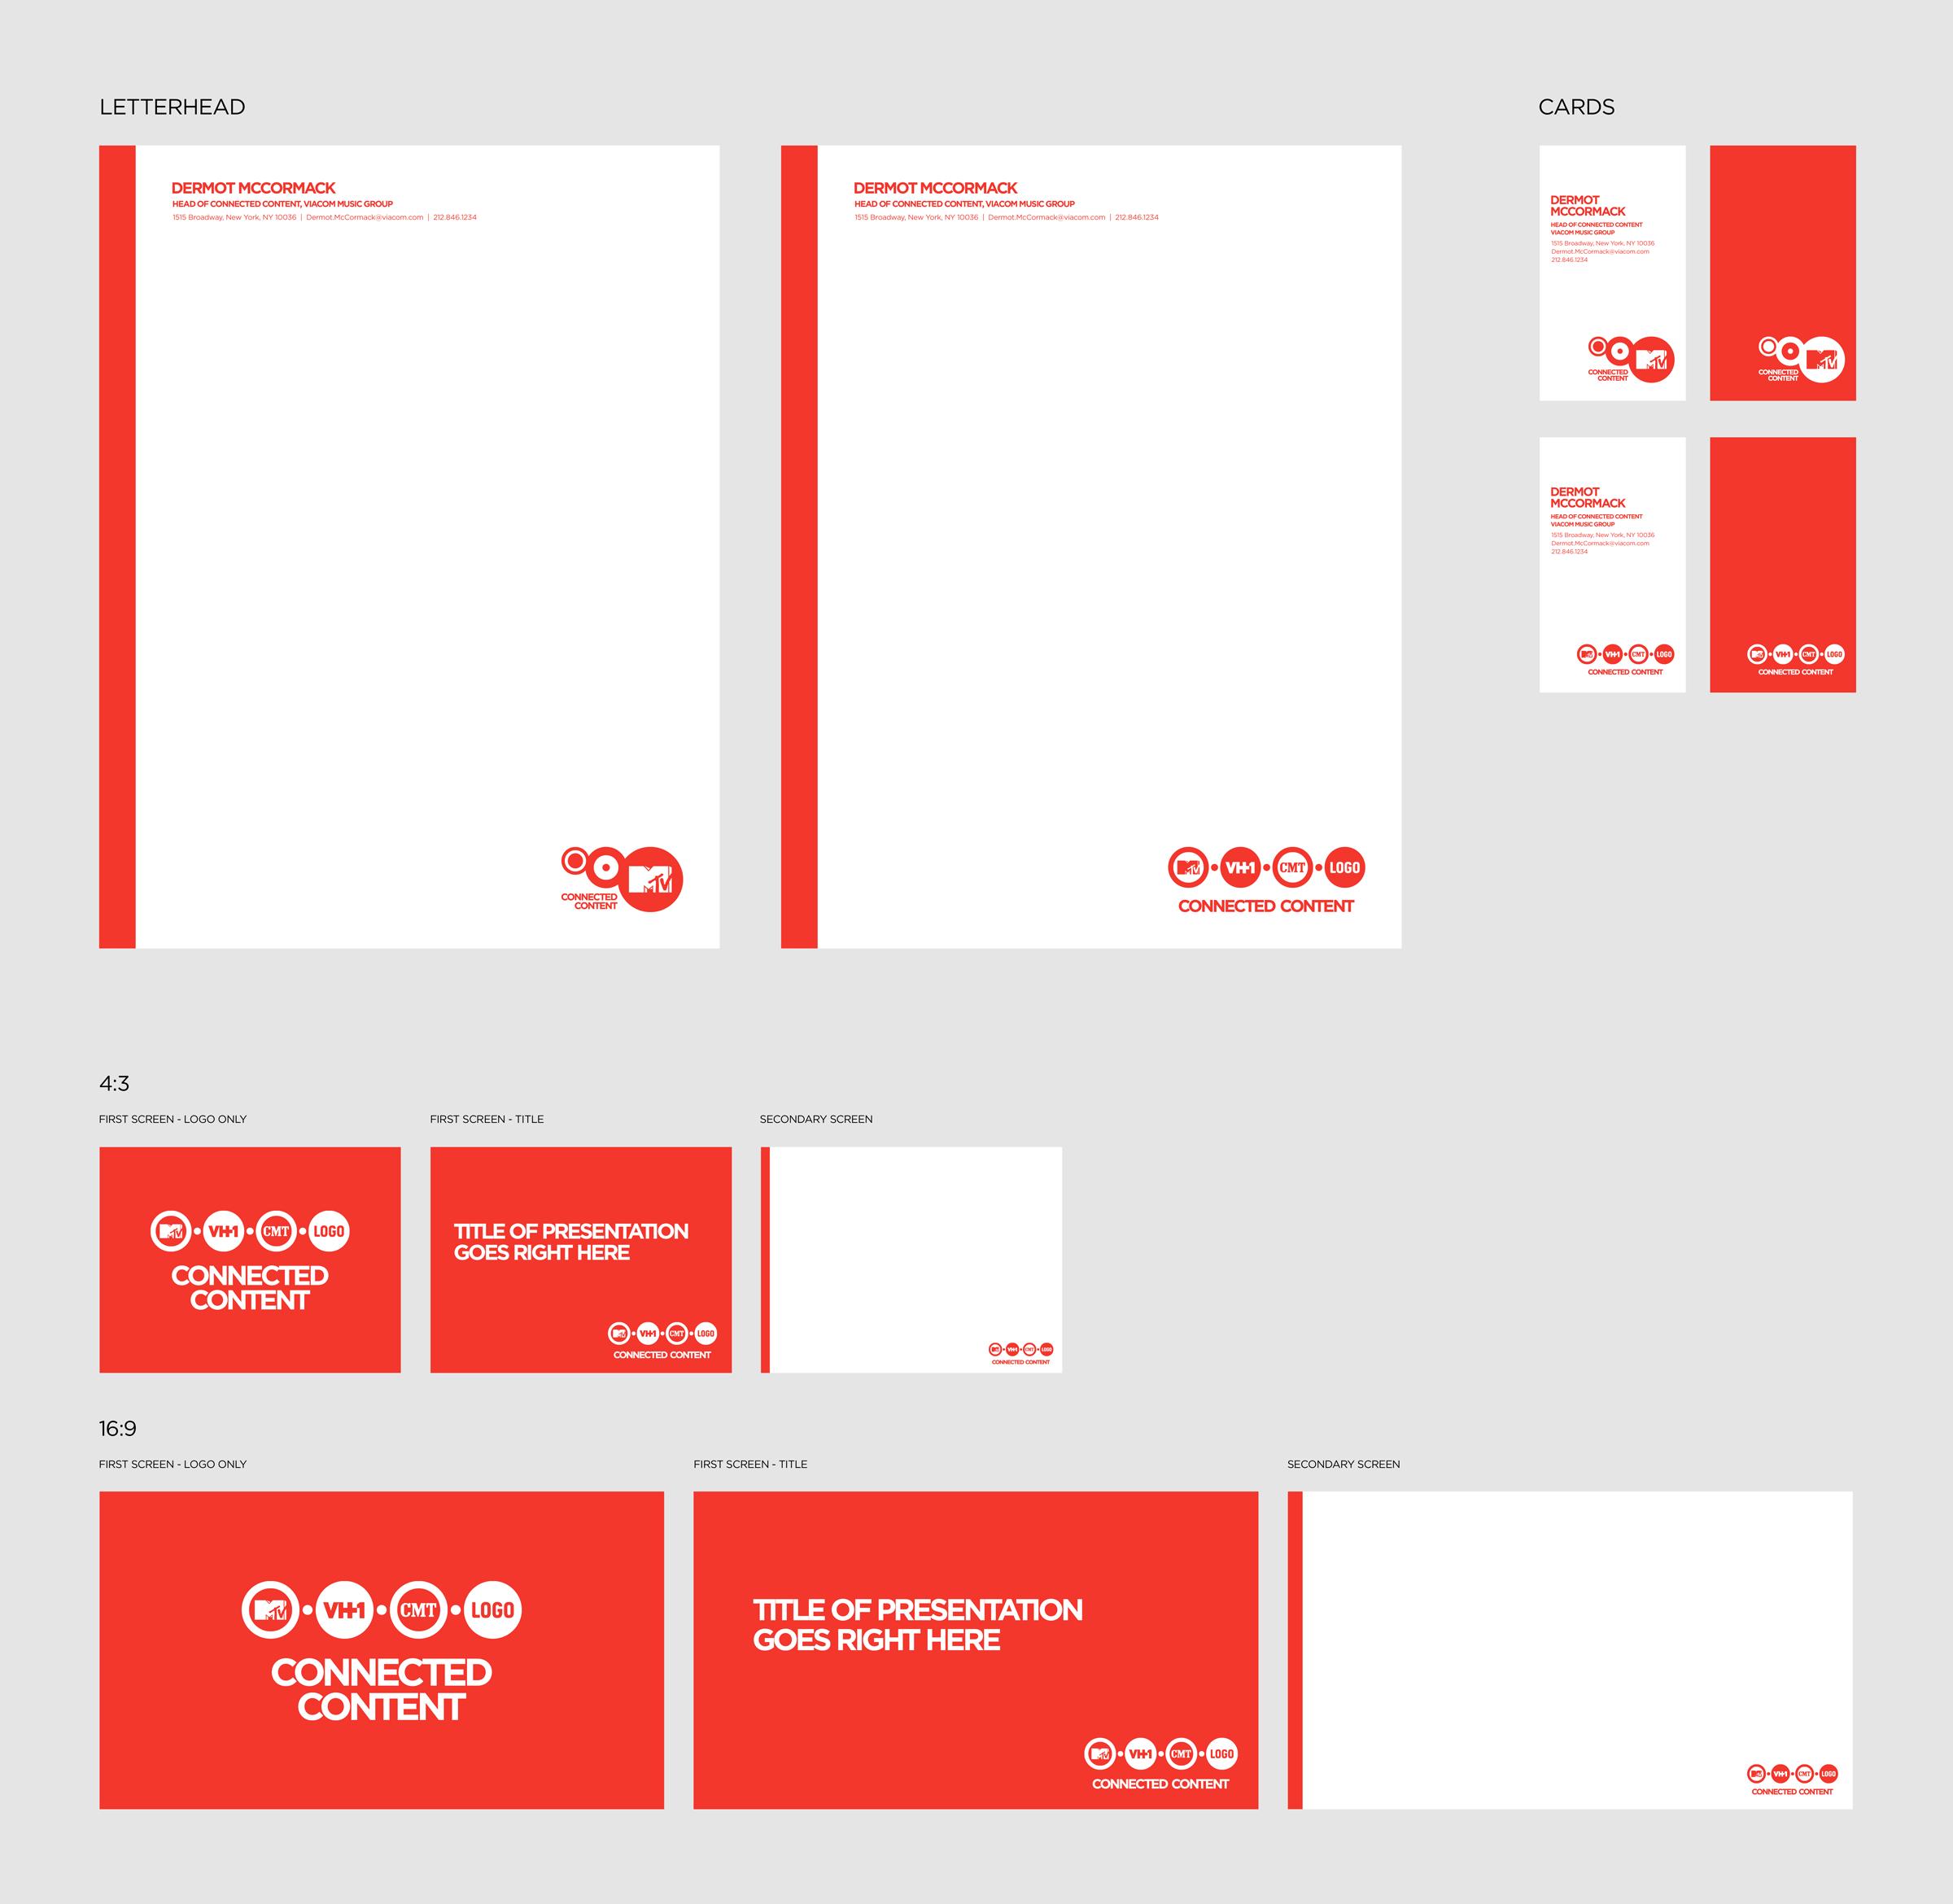 letterhead_cards-slides-1SHEET-2400x2340.png